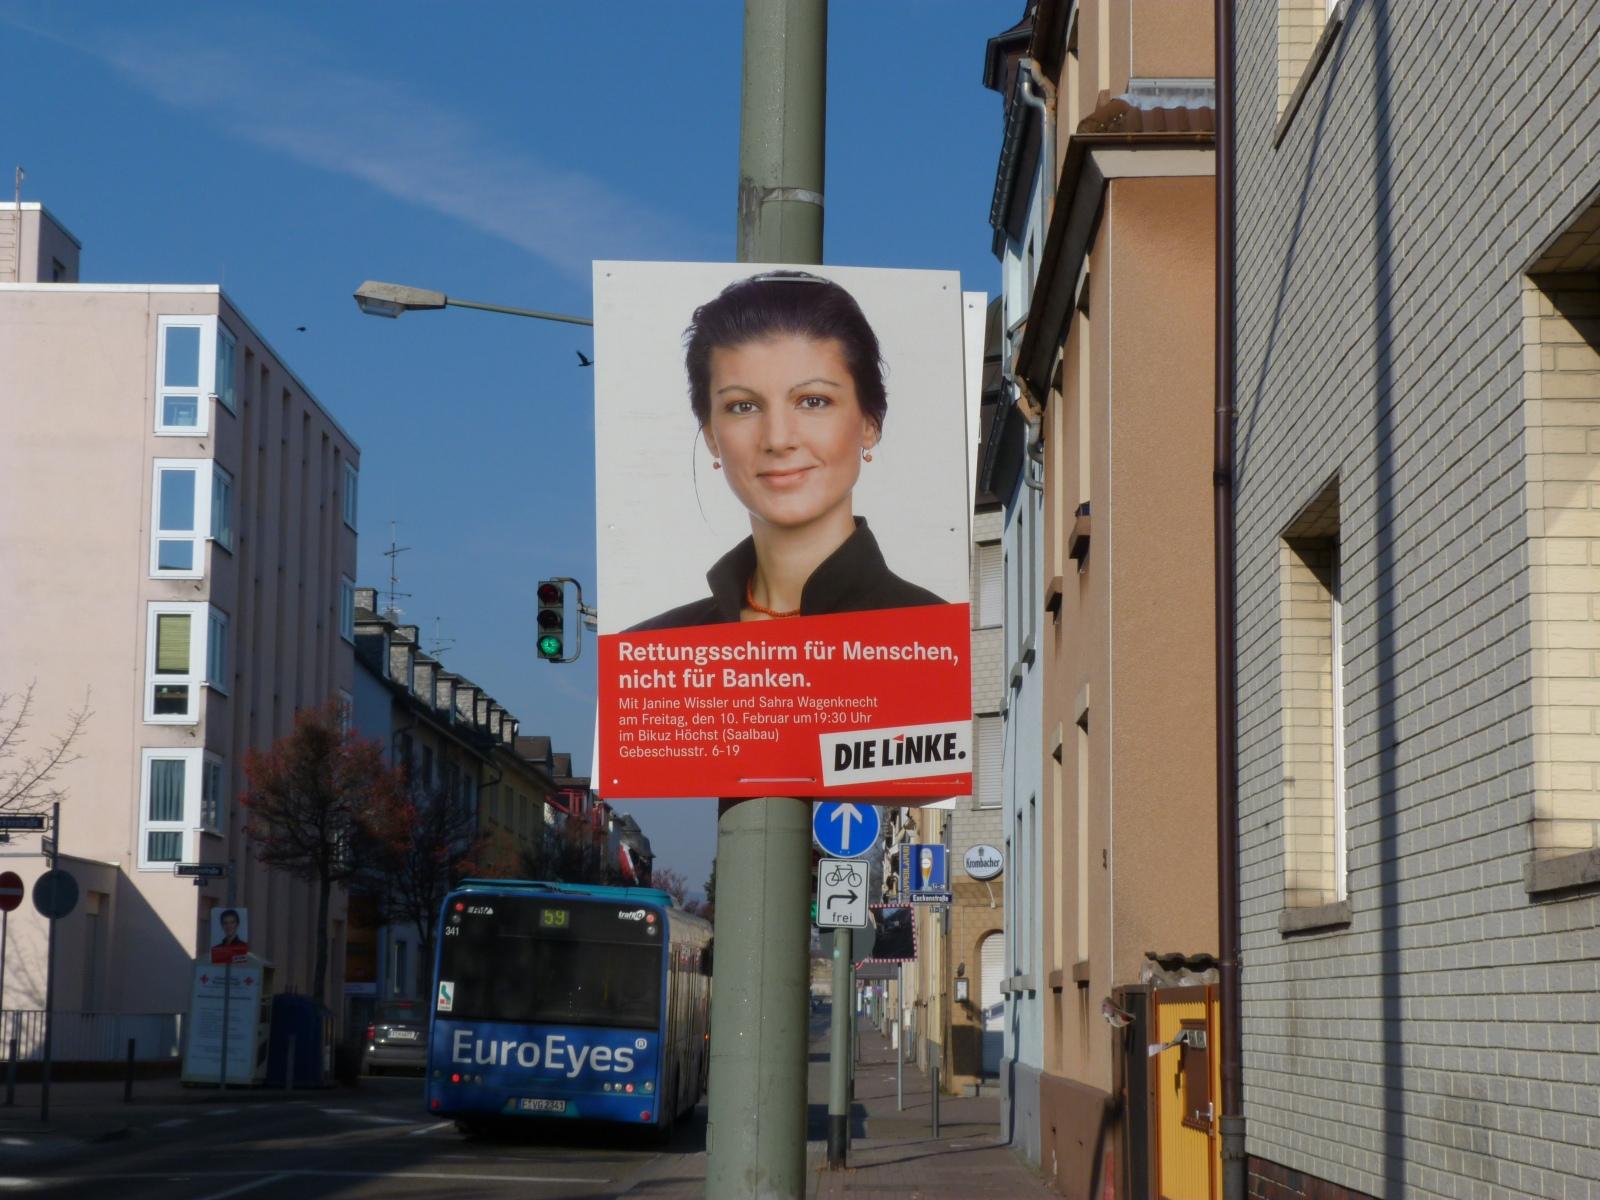 erwachsenen dating Frankfurt am Main